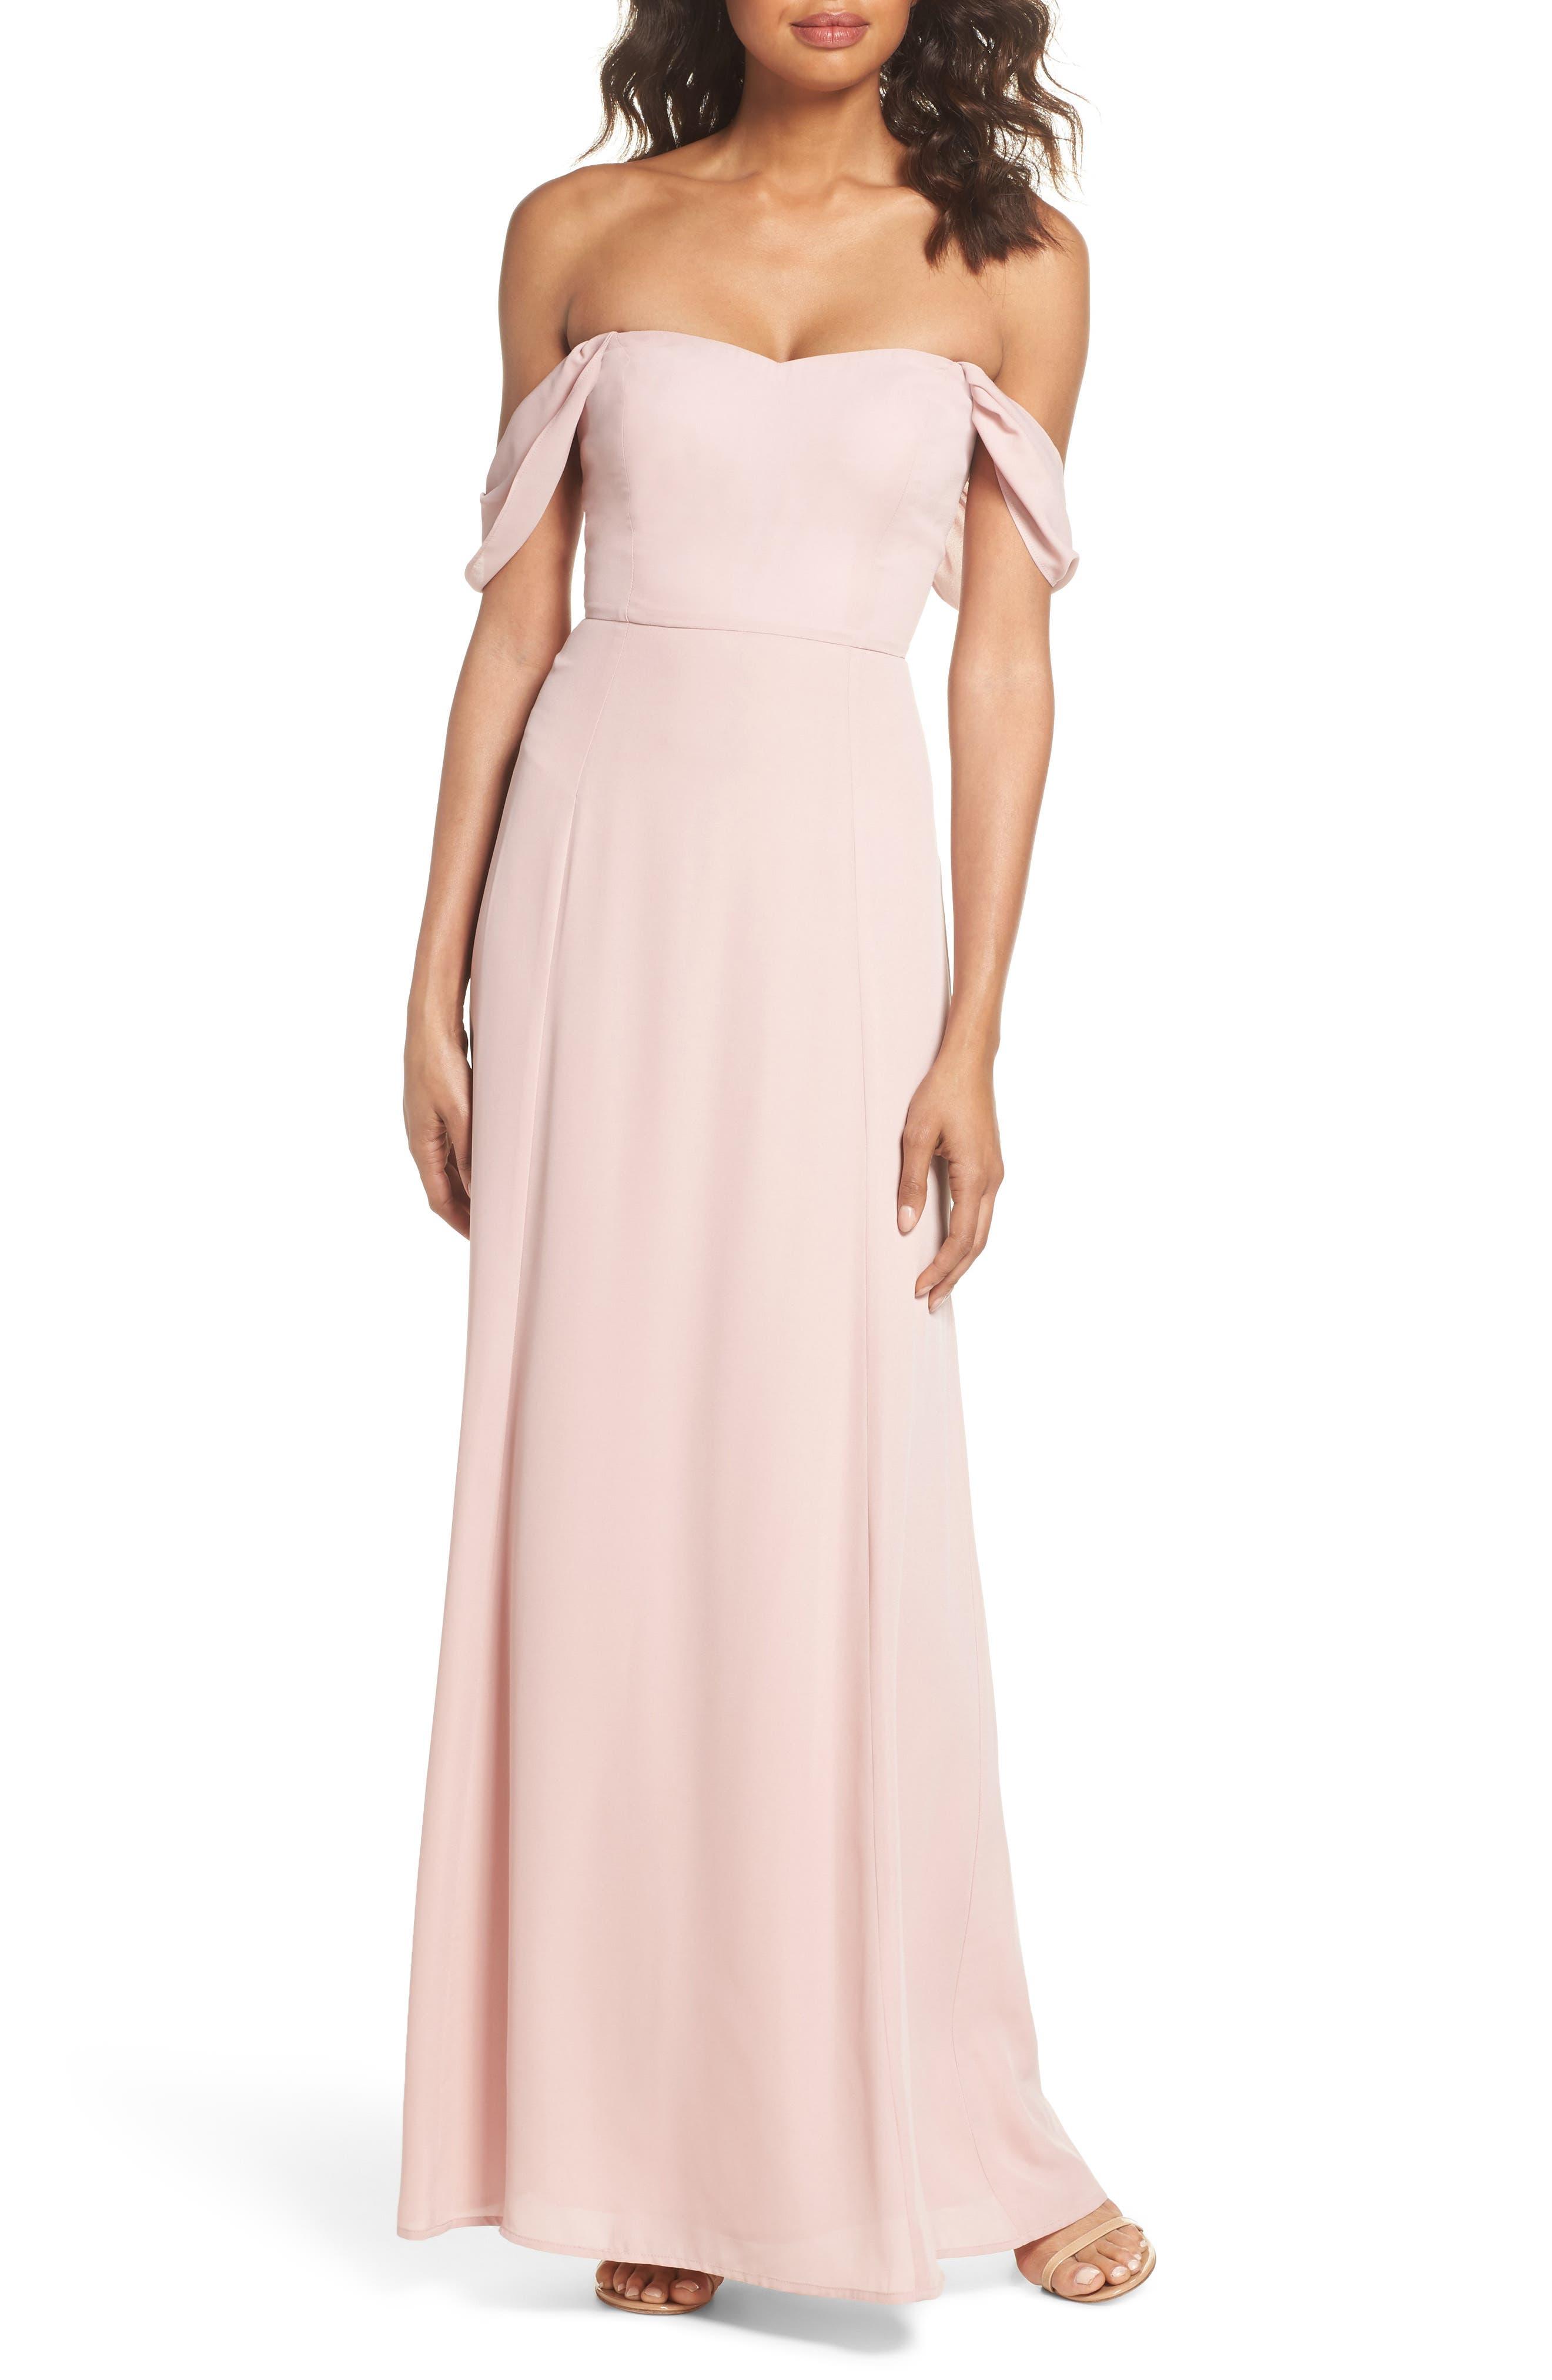 Rachel Off the Shoulder Gored Maxi Dress,                             Main thumbnail 2, color,